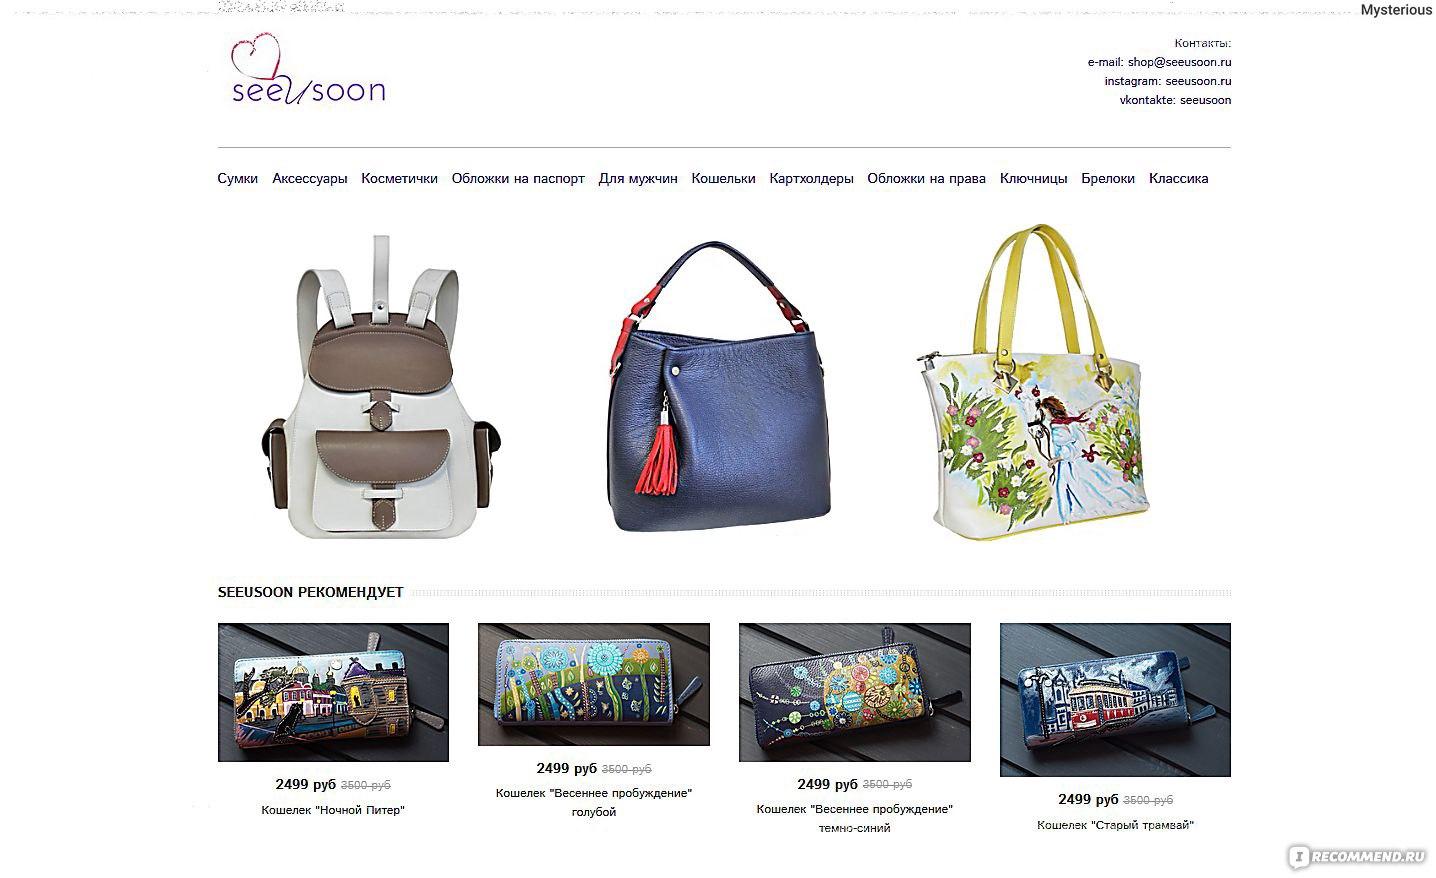 85b6ceaed5230 Сайт Интернет-магазин кожаных сумок и аксессуаров SeeUsoon.ru ...